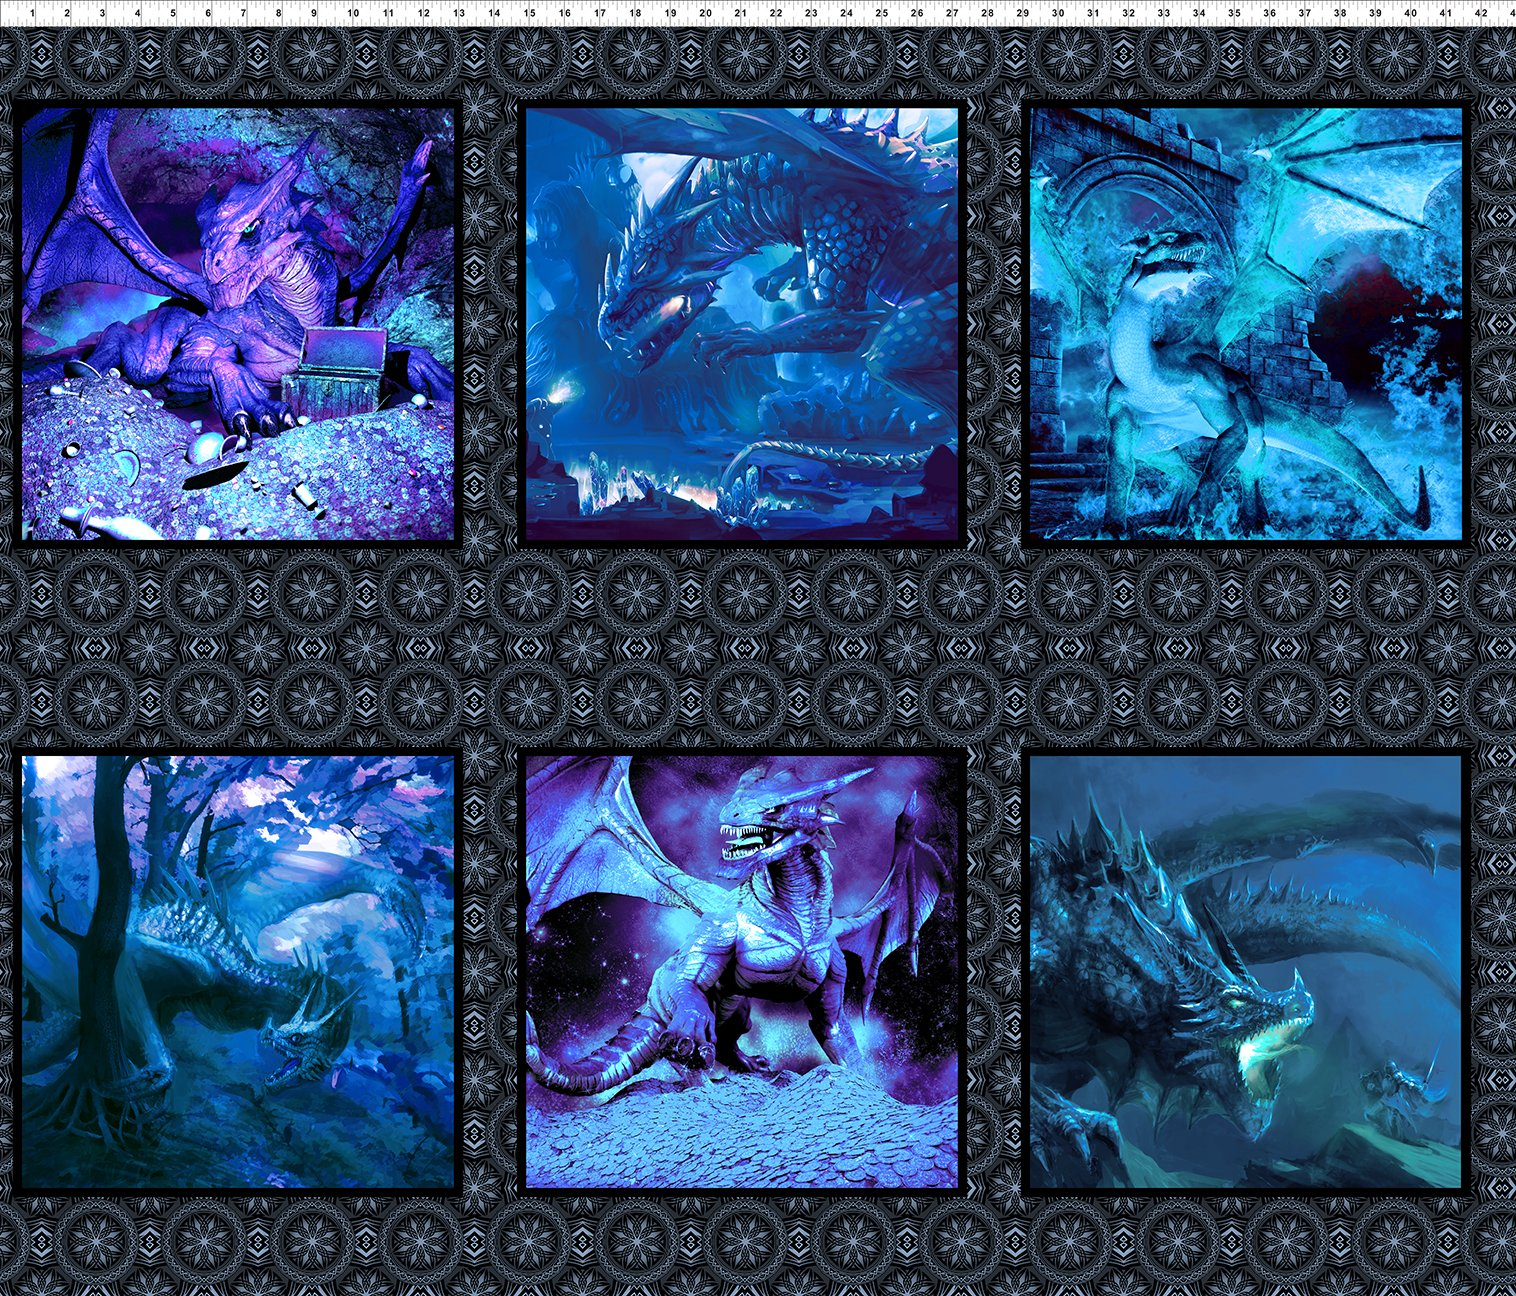 ETA TBA Blue Back in Stock Soon 76 x 92 Quilt Kit in RedOrange or Blue Dragons Quilt Kit from In the Beginning Fabrics